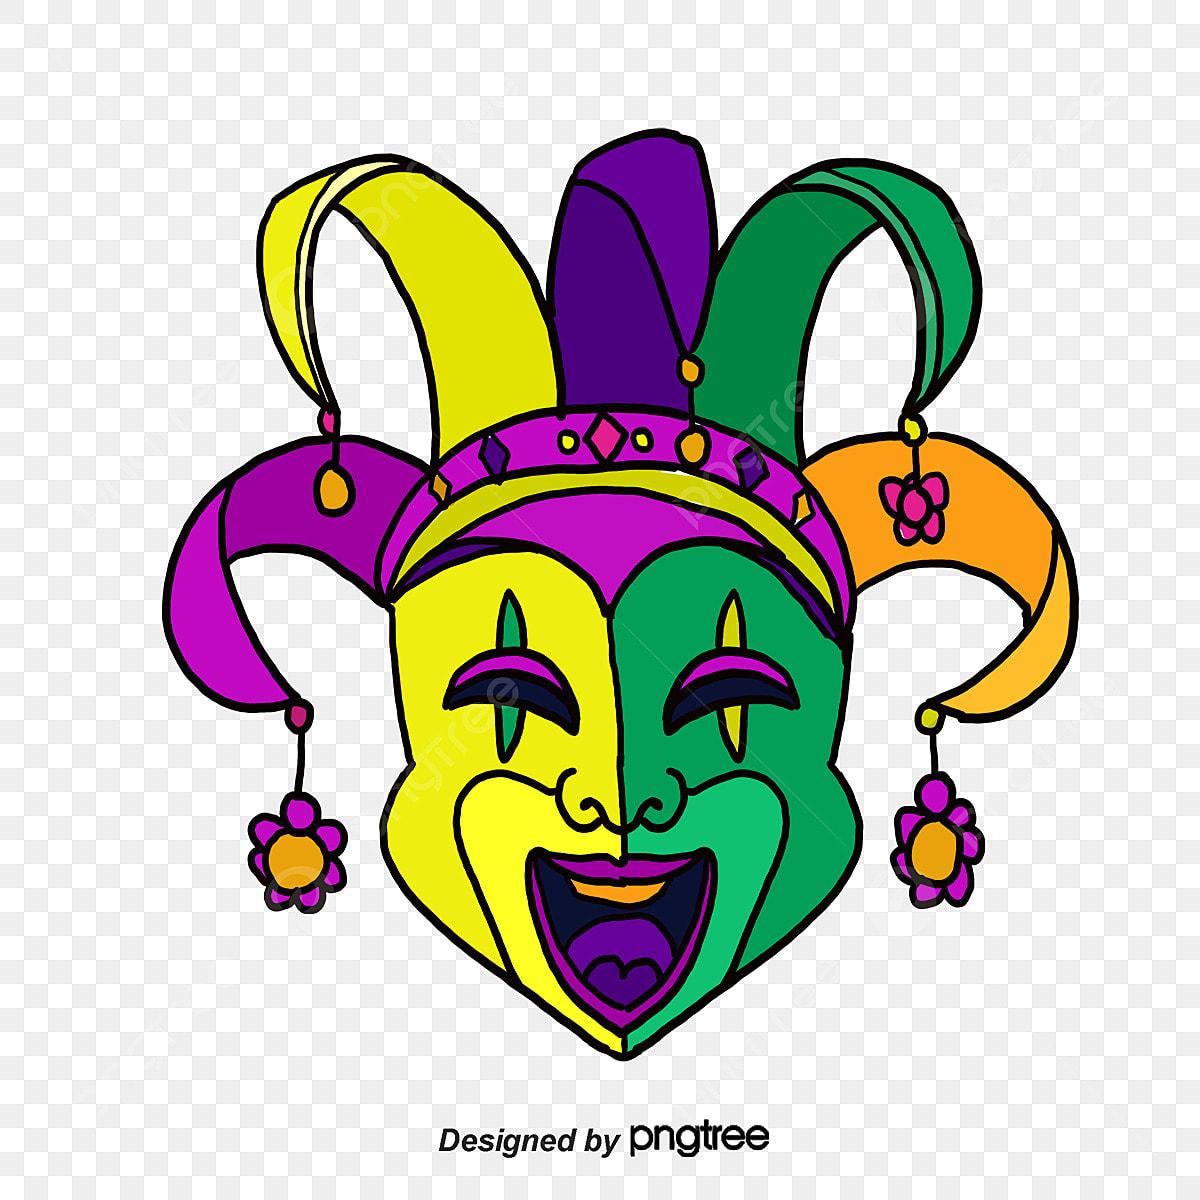 masque mascarade  bal masqu u00e9 d u00e9guisement image png pour le t u00e9l u00e9chargement libre